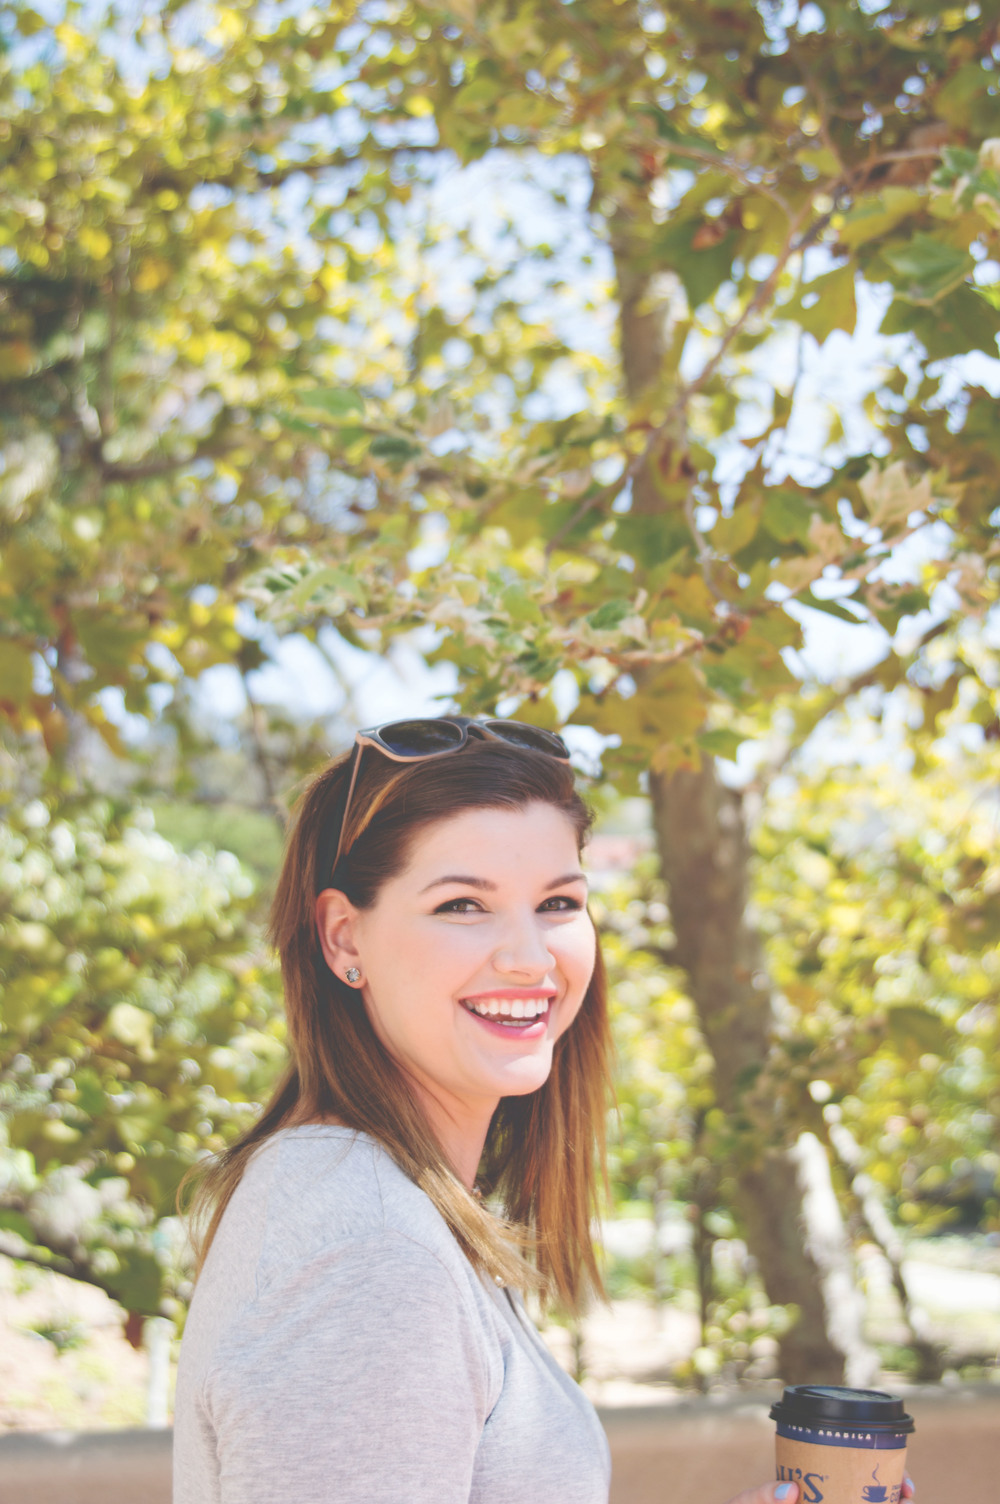 My sister-in-law Kristen is just the prettiest.